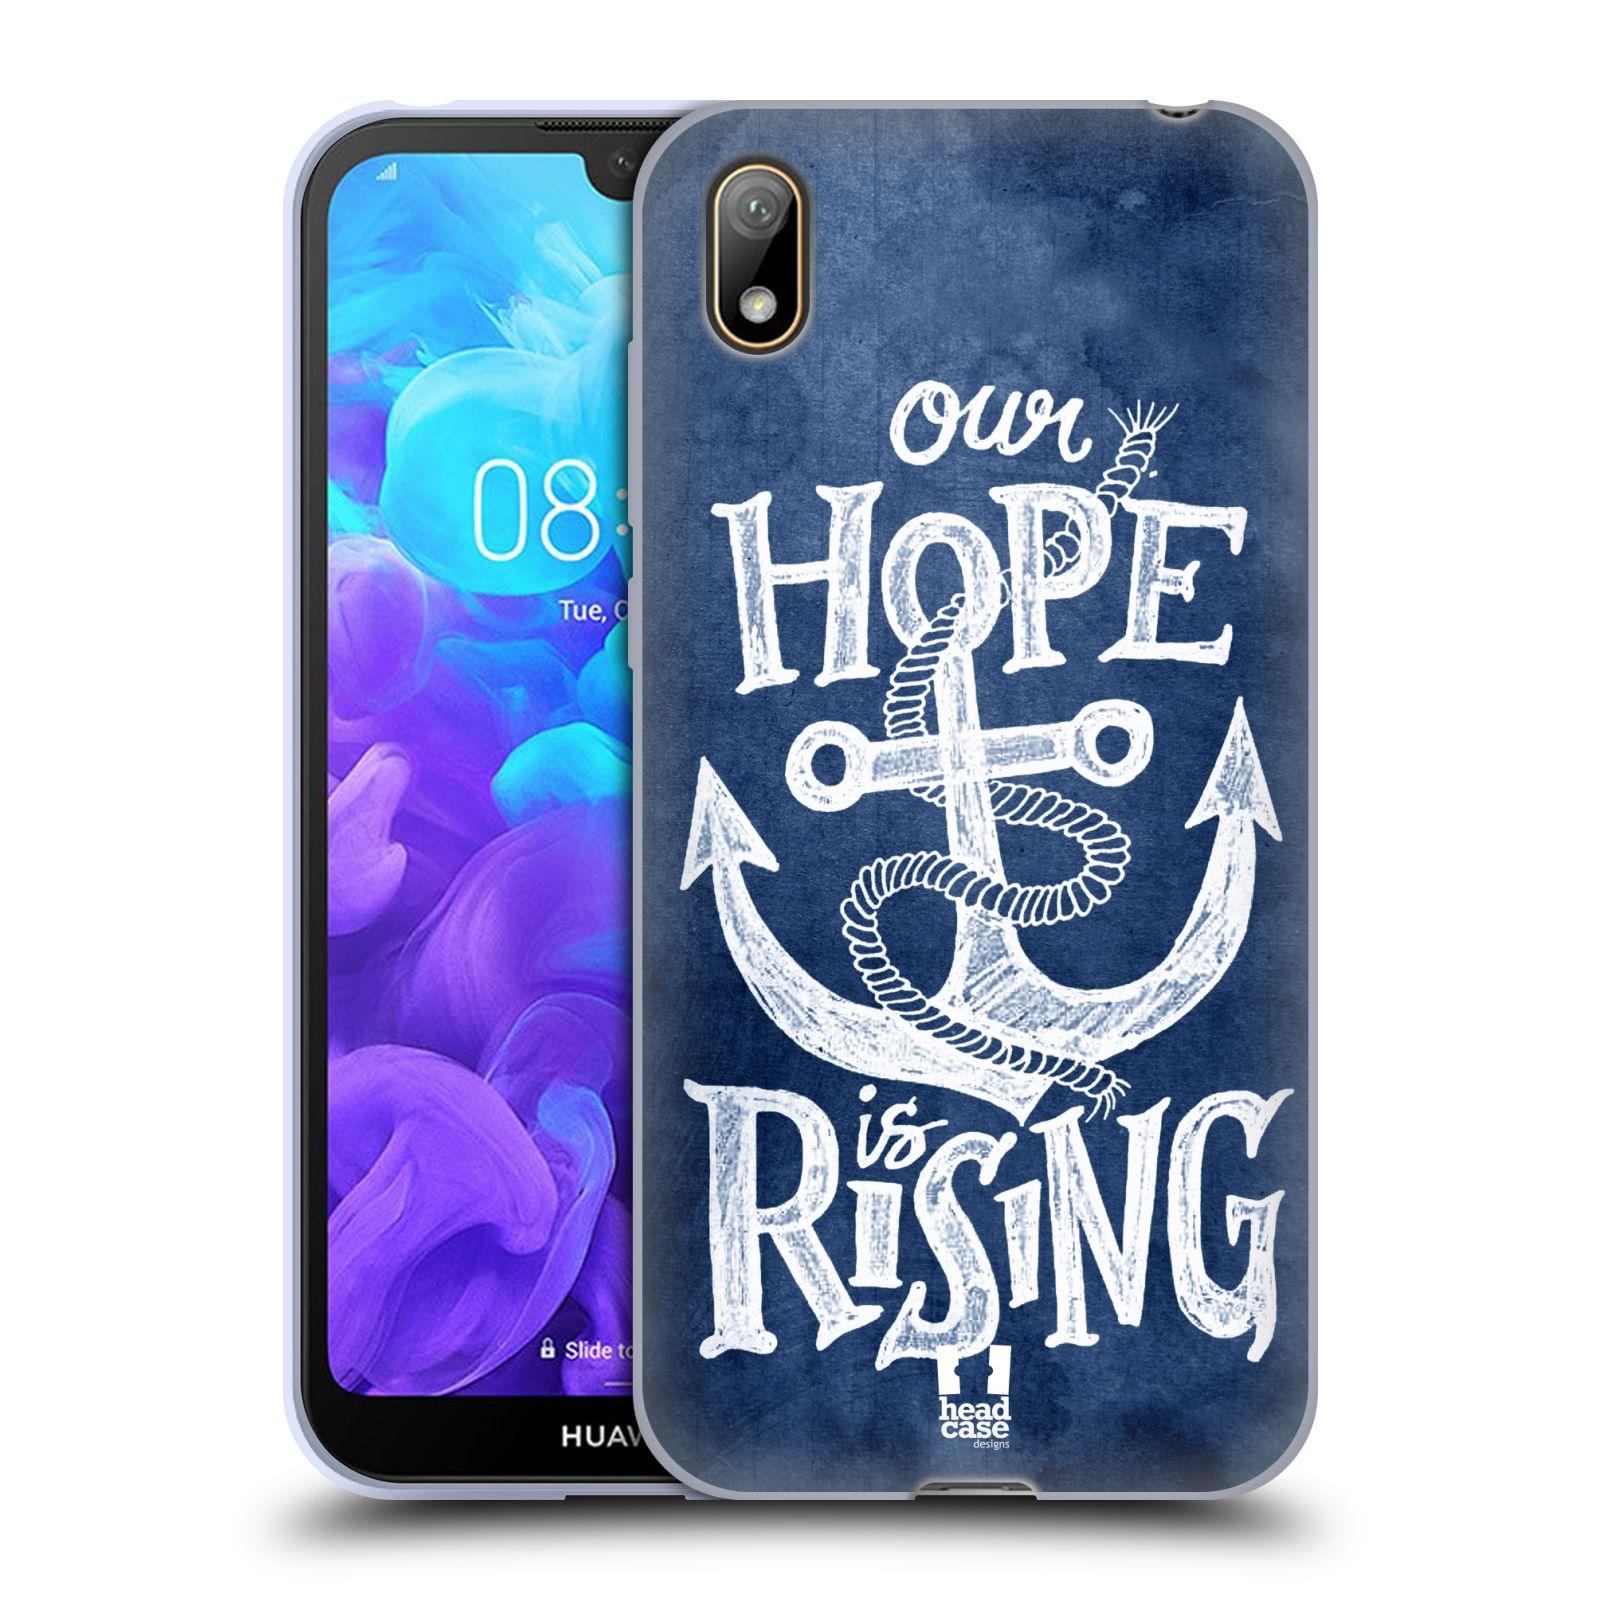 Silikonové pouzdro na mobil Huawei Y5 (2019) - Head Case - KOTVA RISING